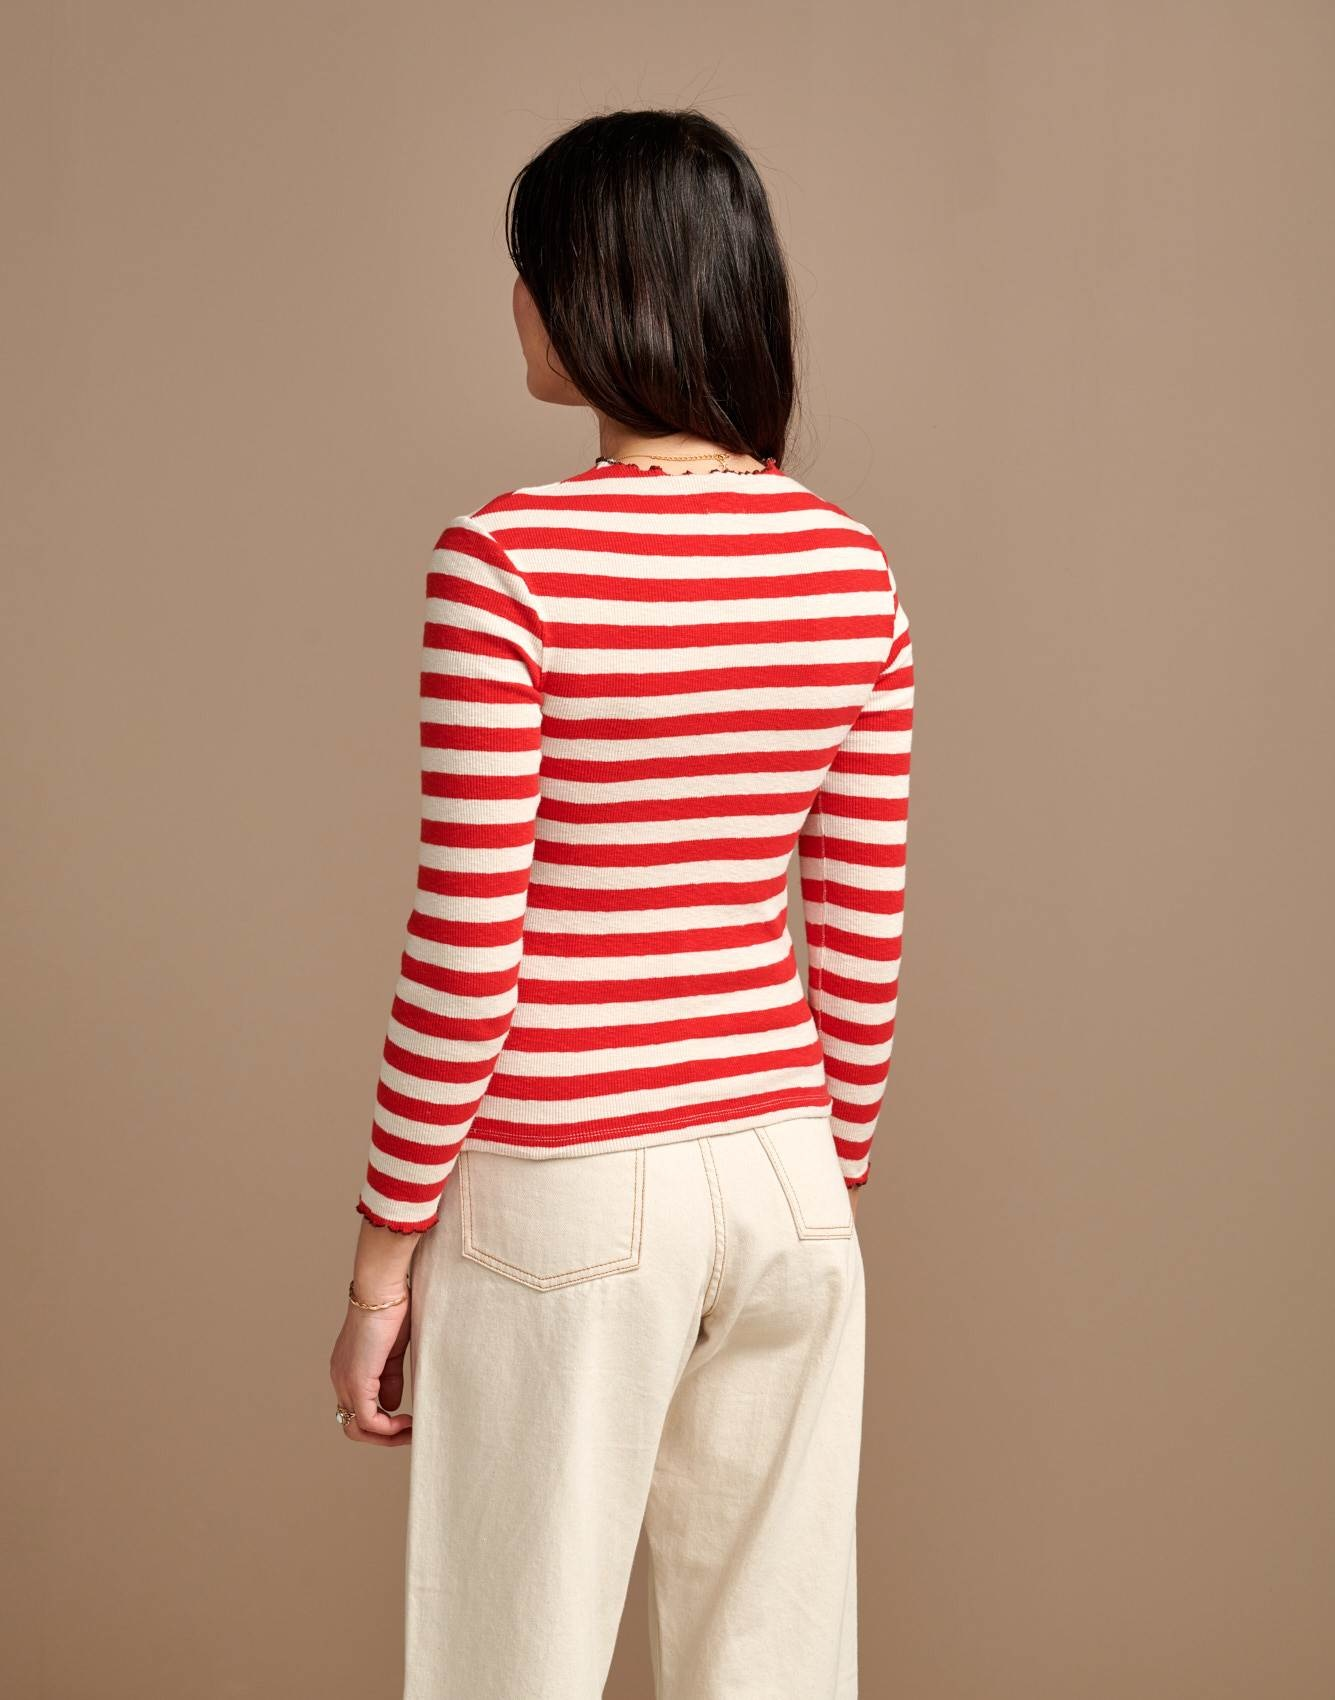 Bellerose Bellerose Niba  Striped Knit Top